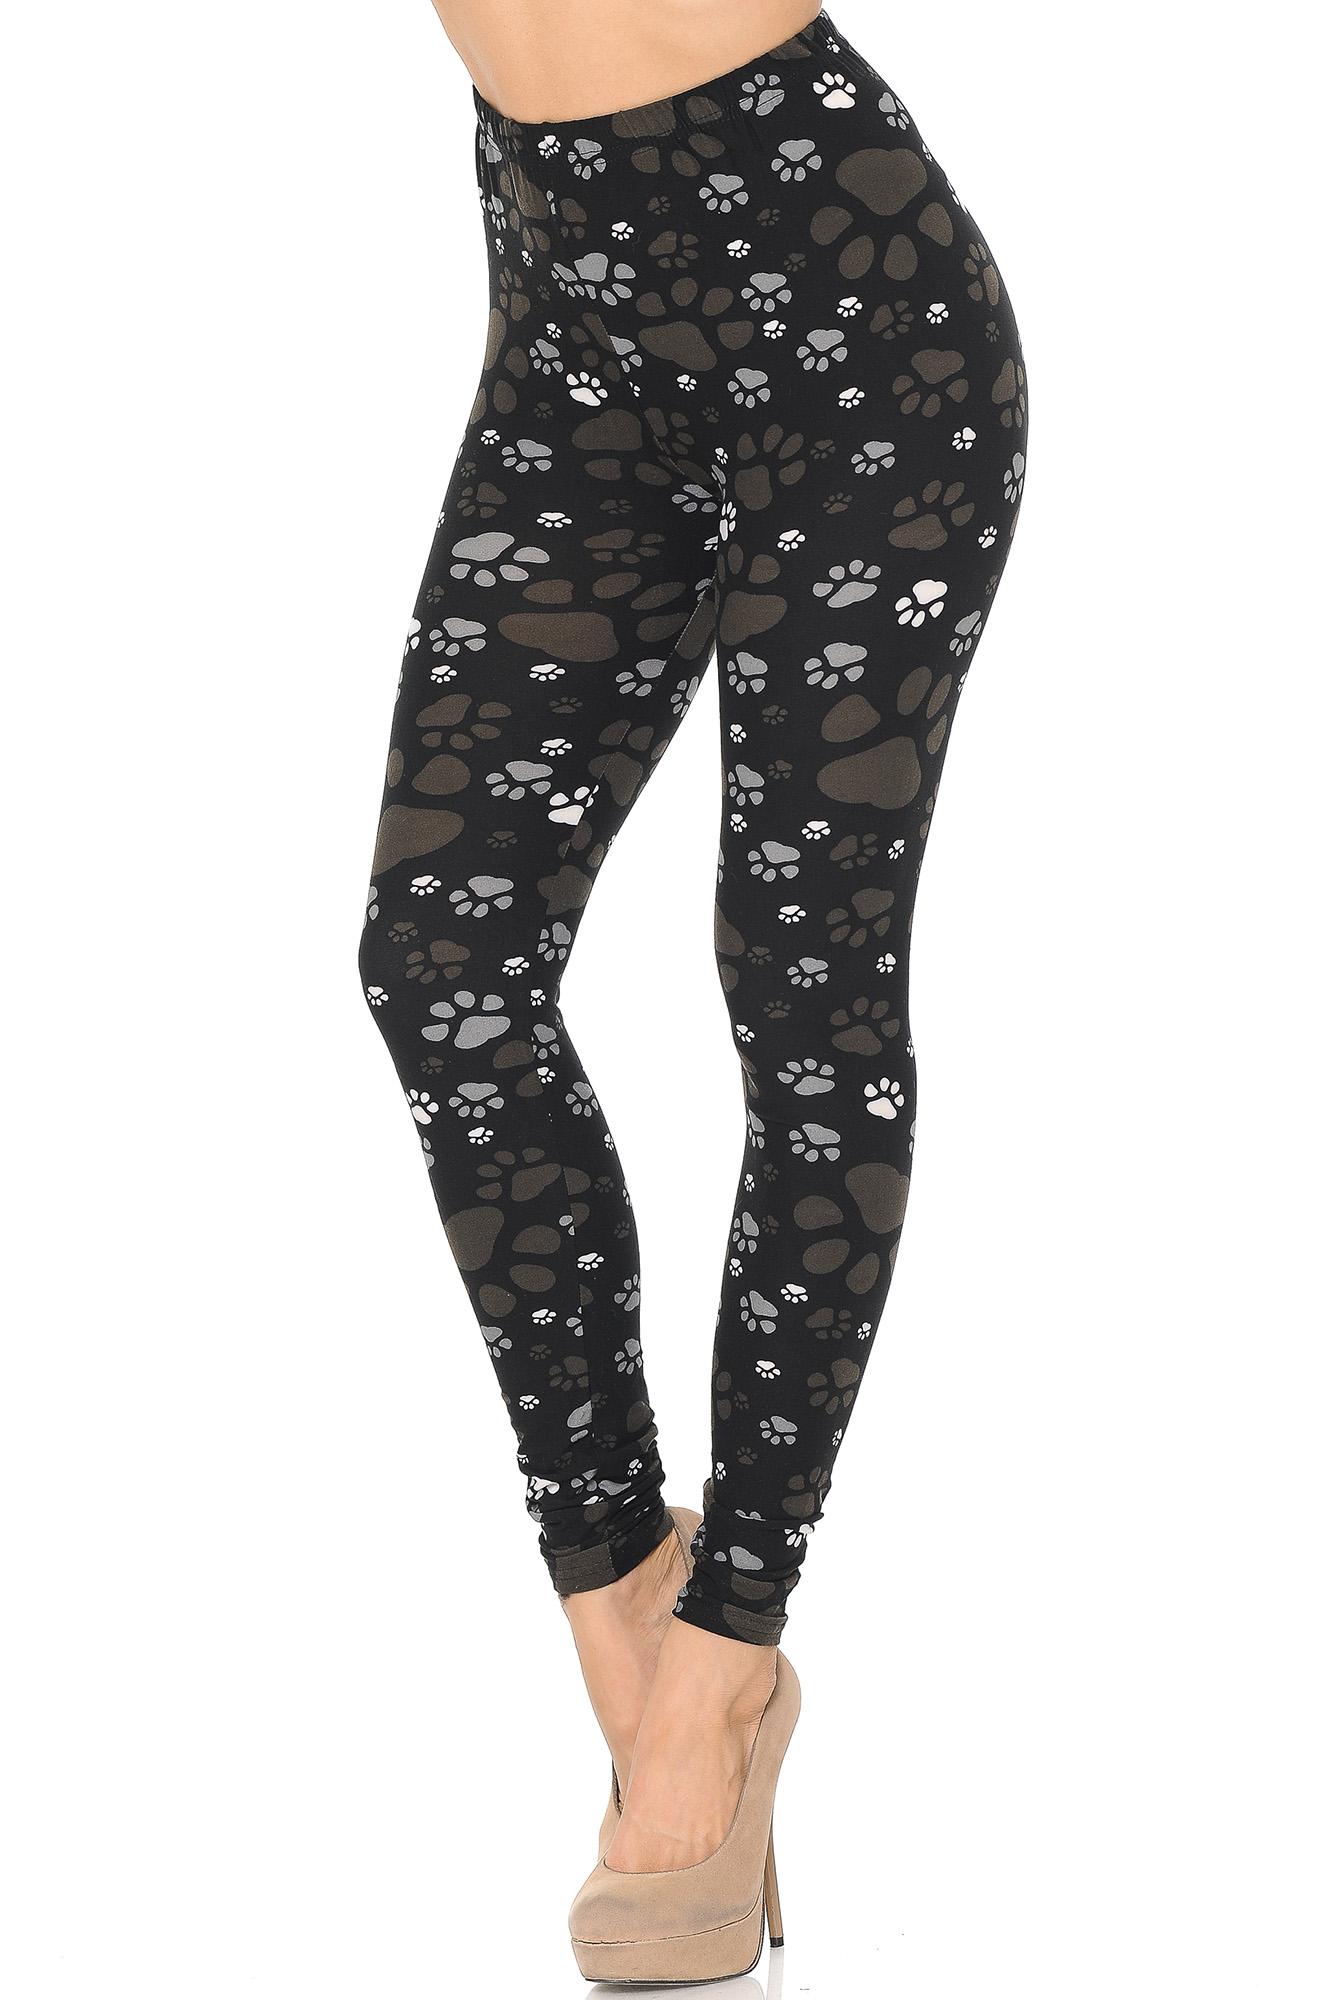 ff8a6ec5345645 Buttery Soft Muddy Paw Print Leggings - USA Fashion | World of Leggings